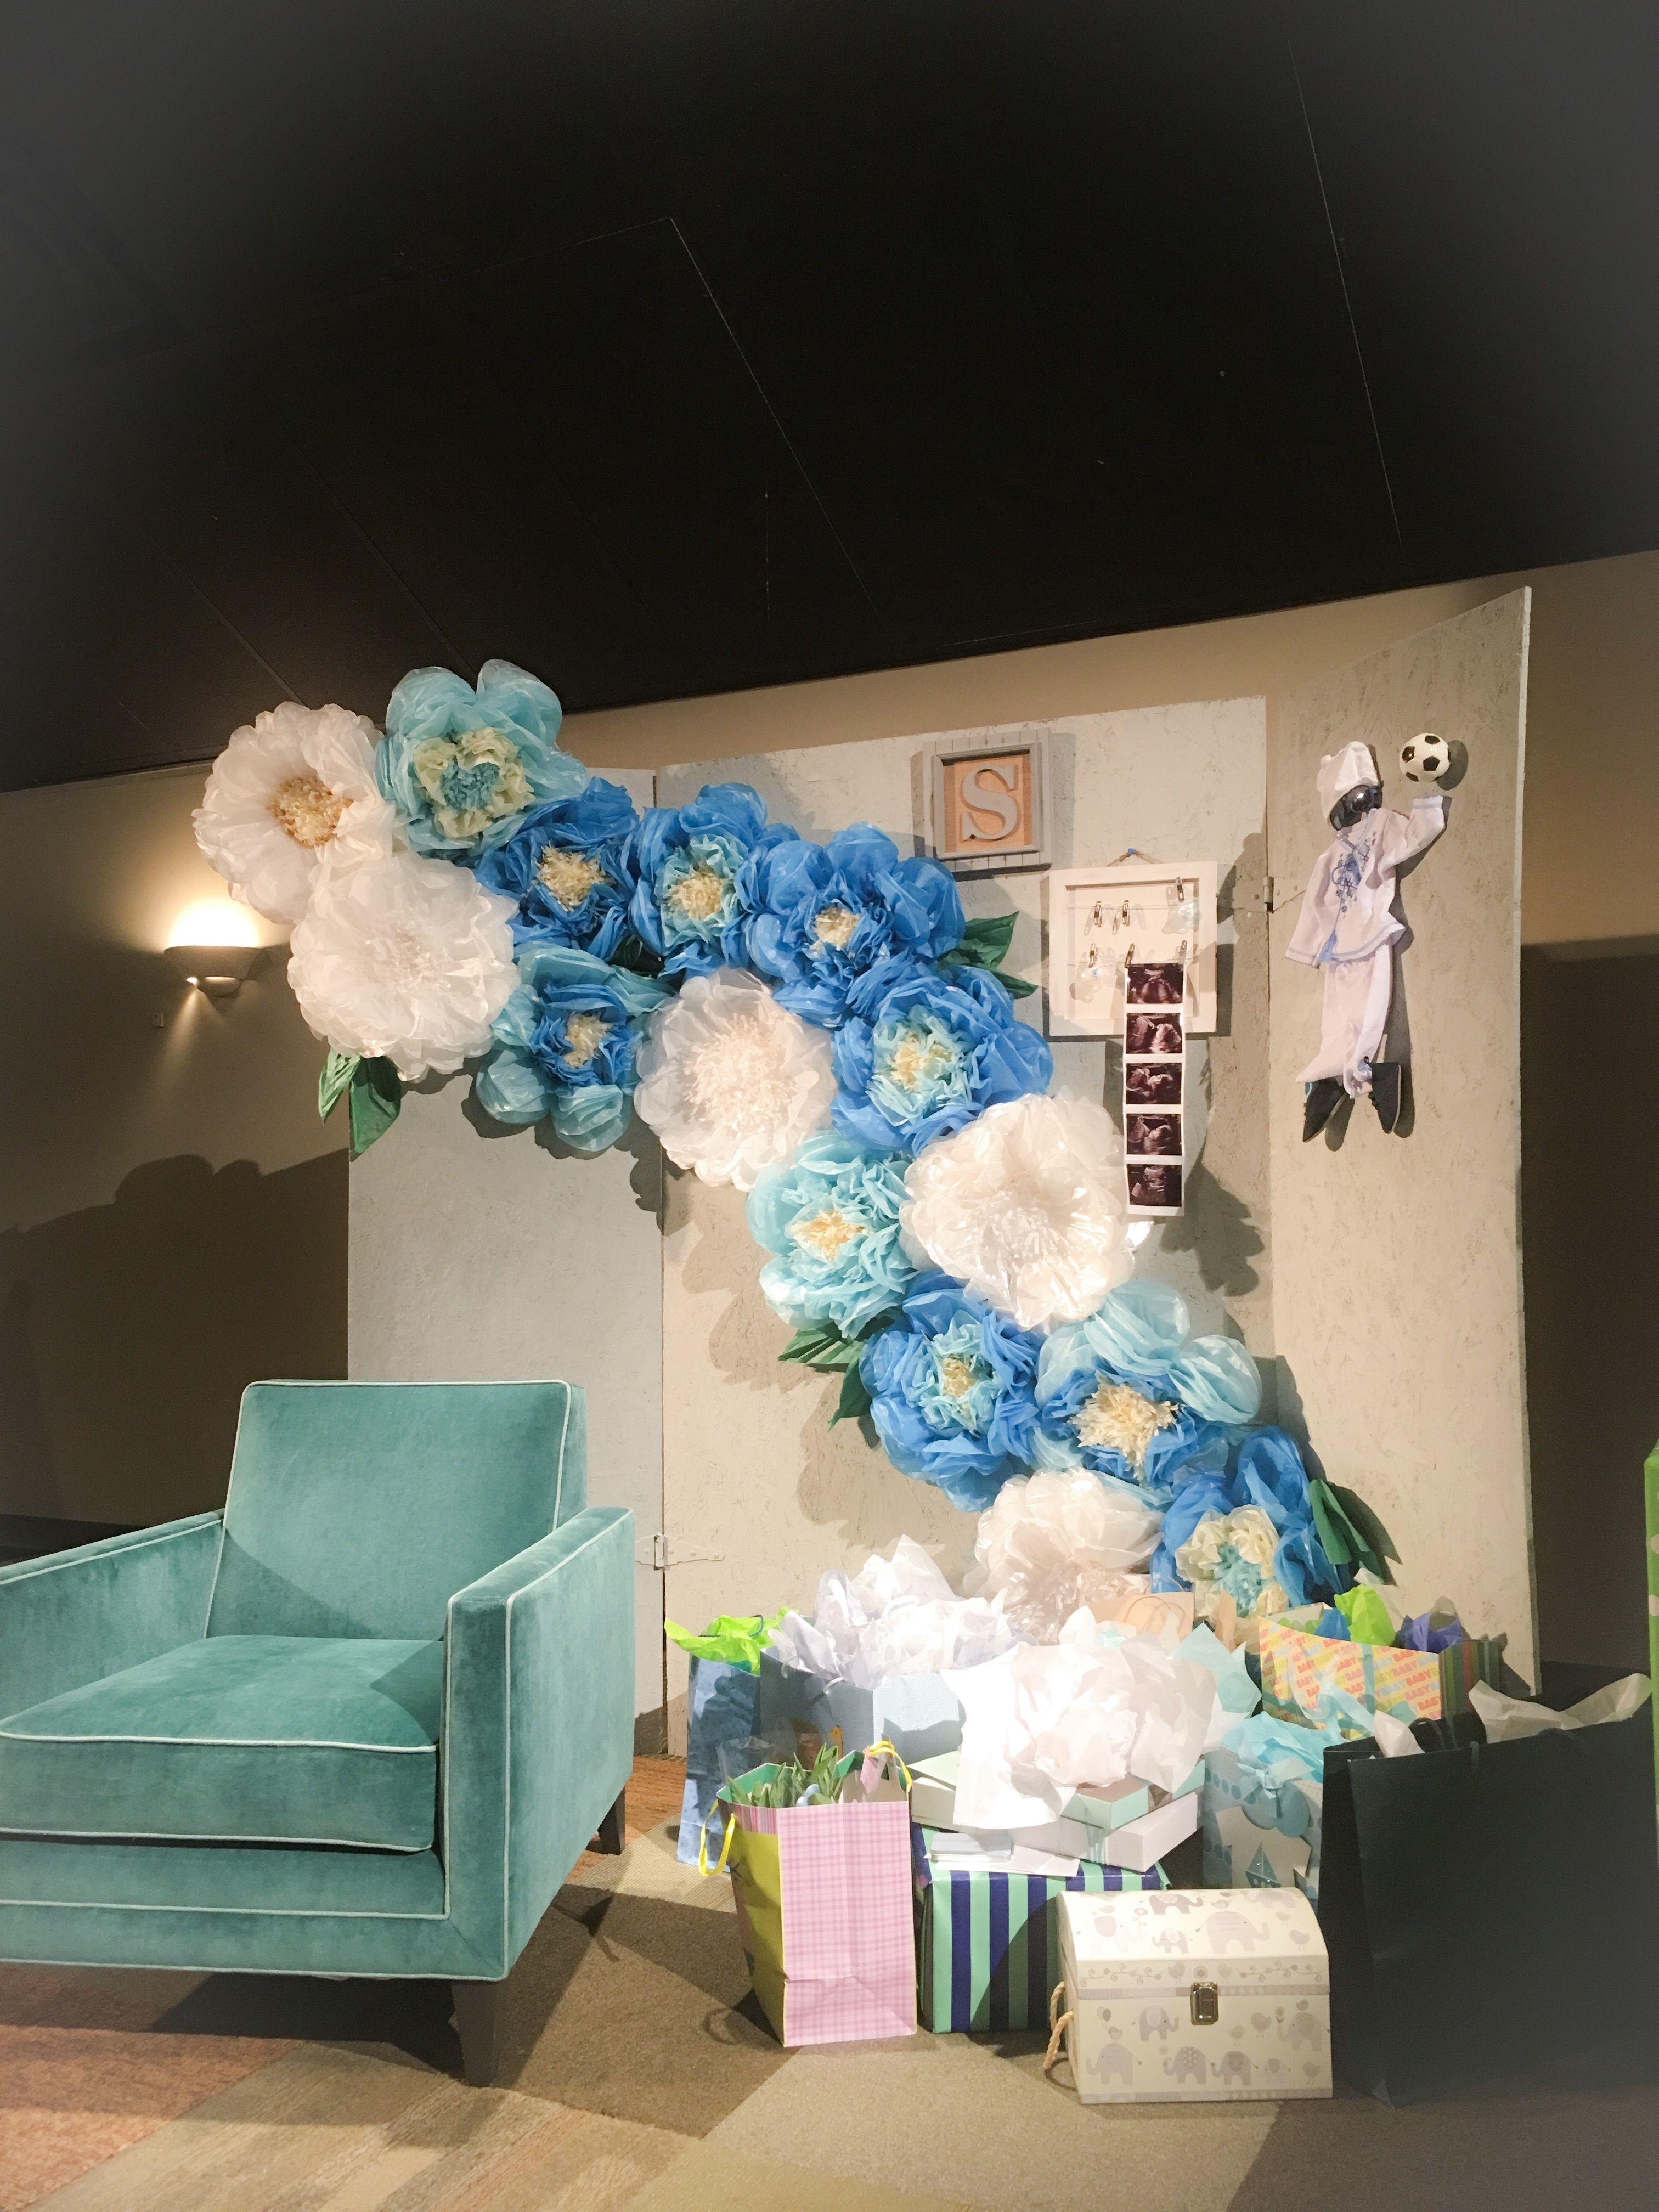 Baby Shower Decorations Decor Blue Itu0027s A Boy Gray Backdrop Plywood  Backdrop Event Decor Tissue Paper